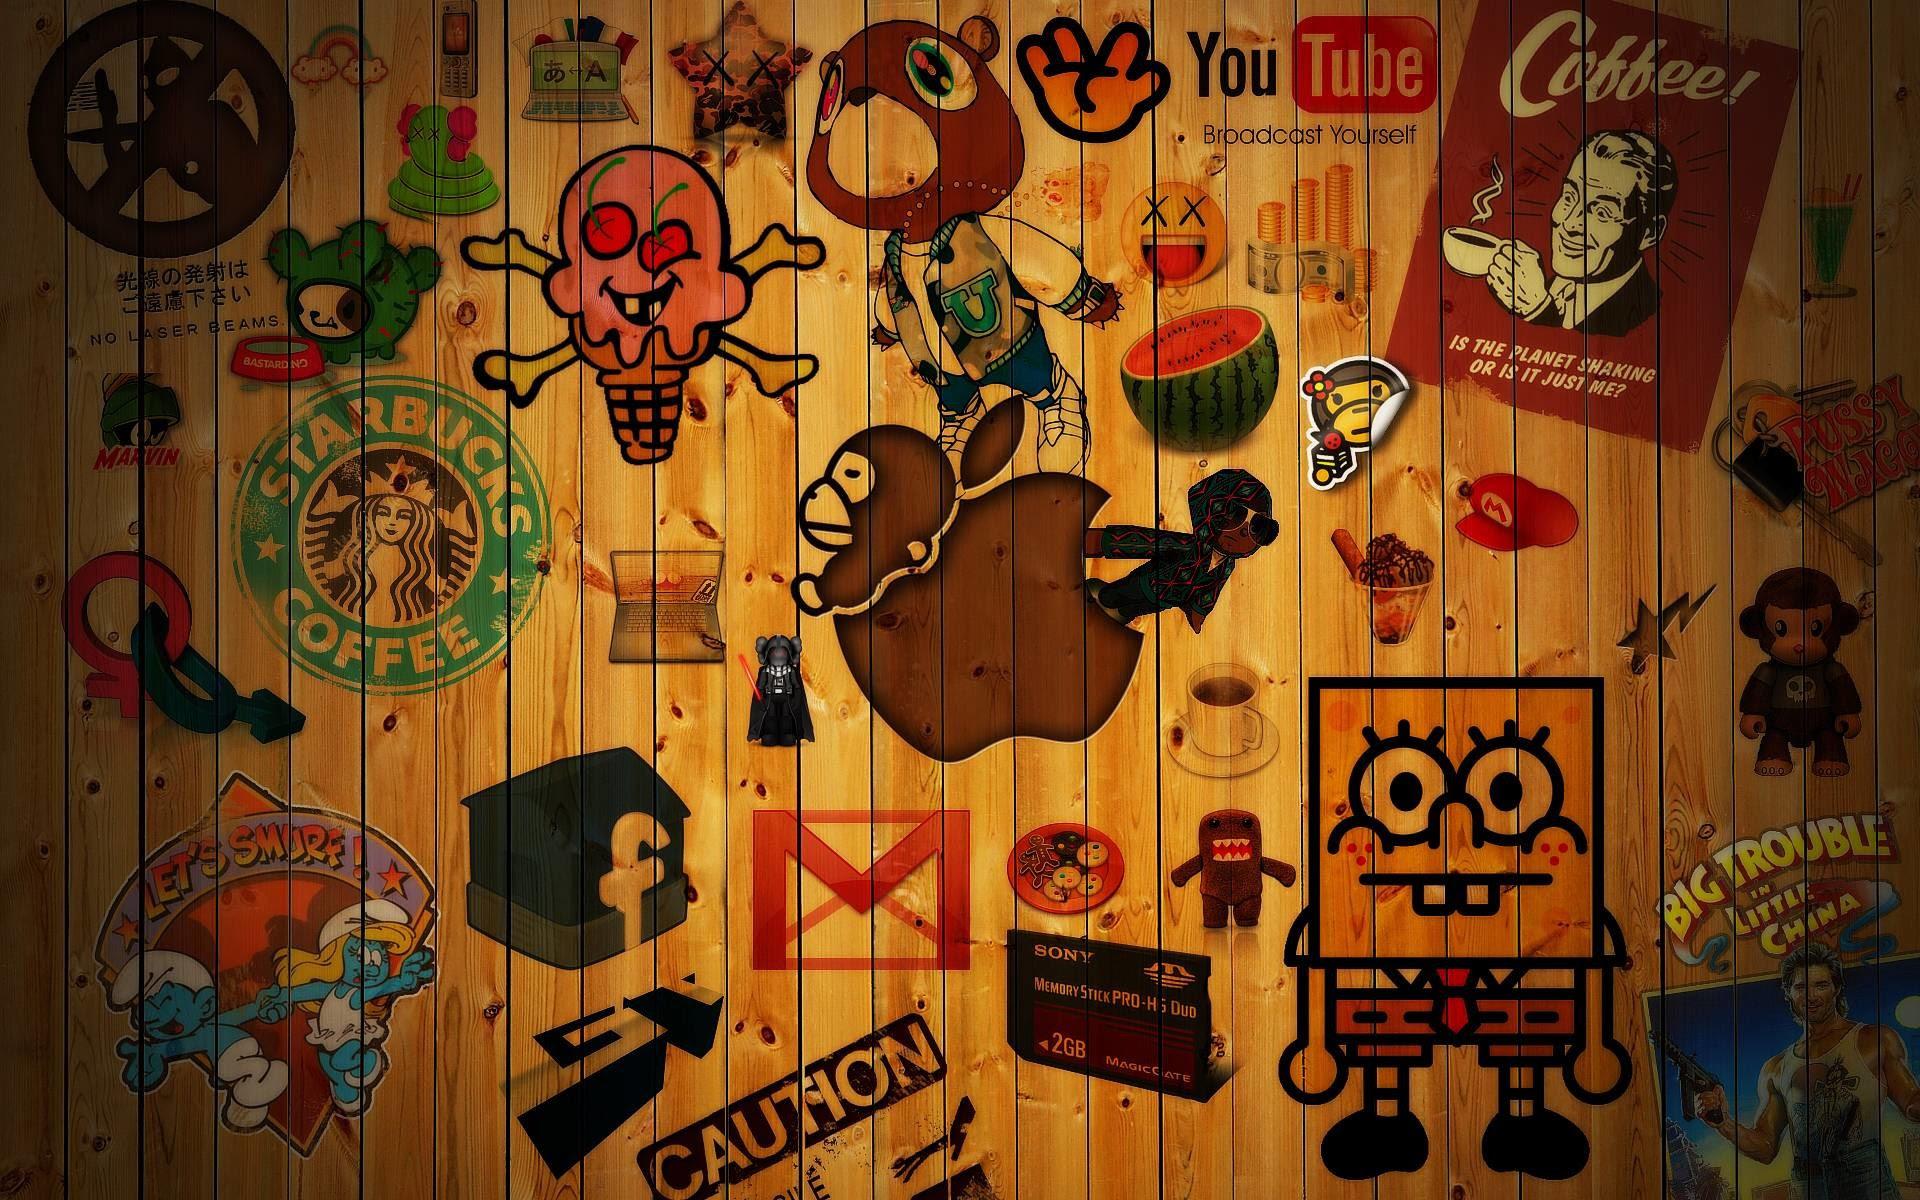 Unduh 920 Koleksi Wallpaper Hp Doodle HD Gratid